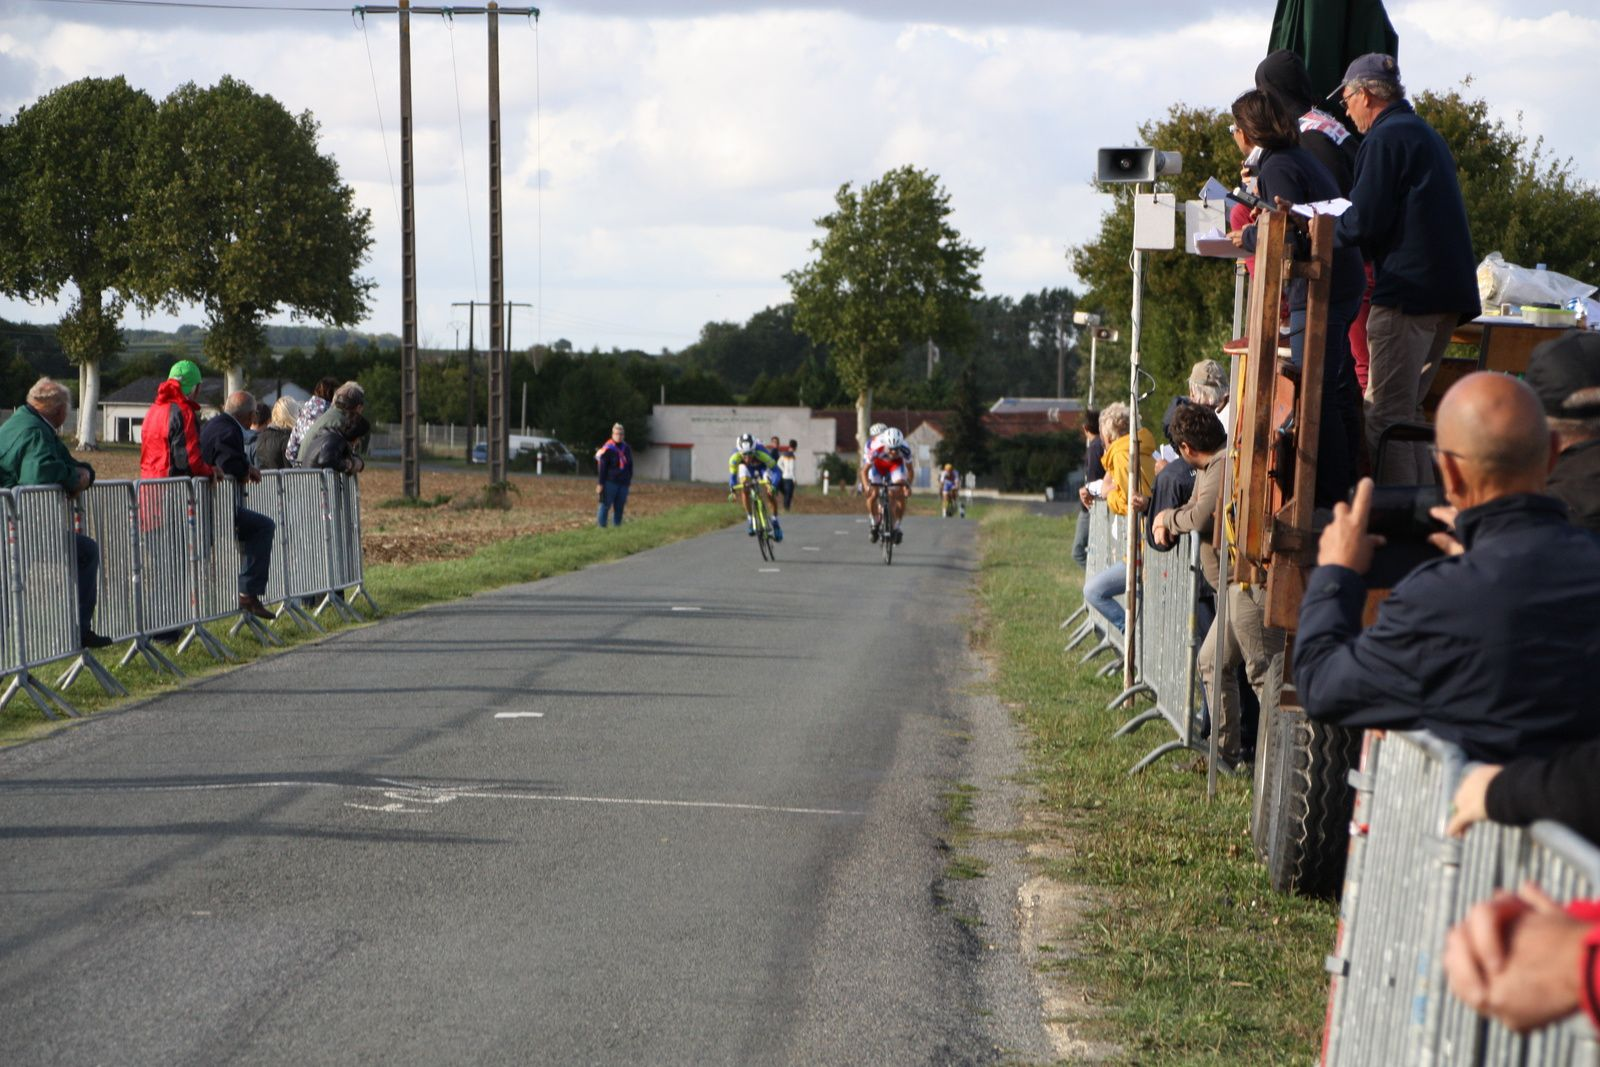 2e  Valentin  CARLI(UC  Dalencon Damigny), 3e  Emmanuel  HERBRETEAU(AC Jarnac-Aigre-Rouillac)